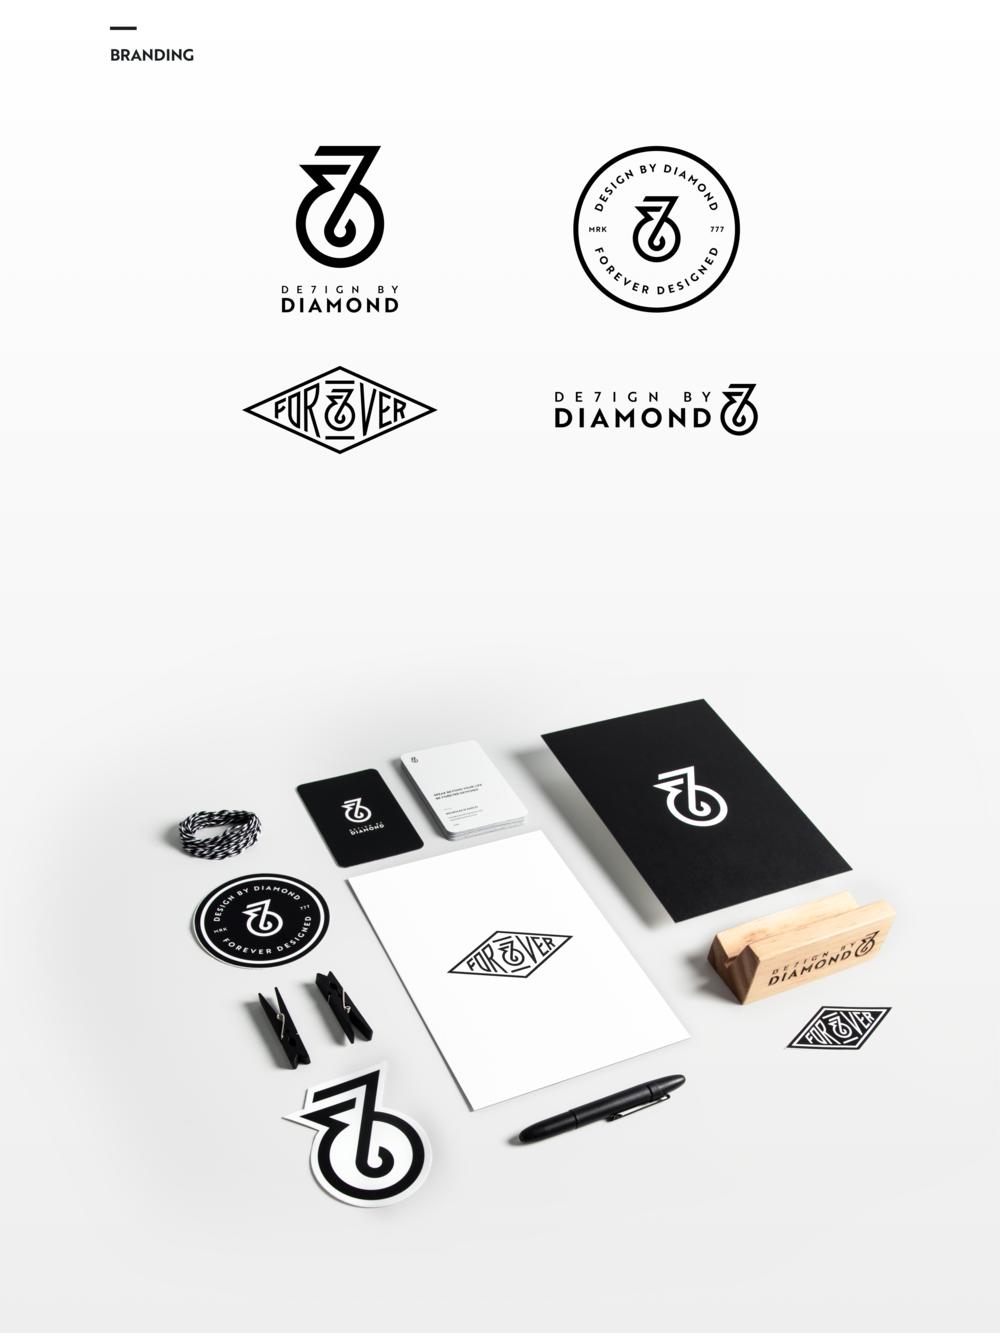 Design-By-Diamond - Branding